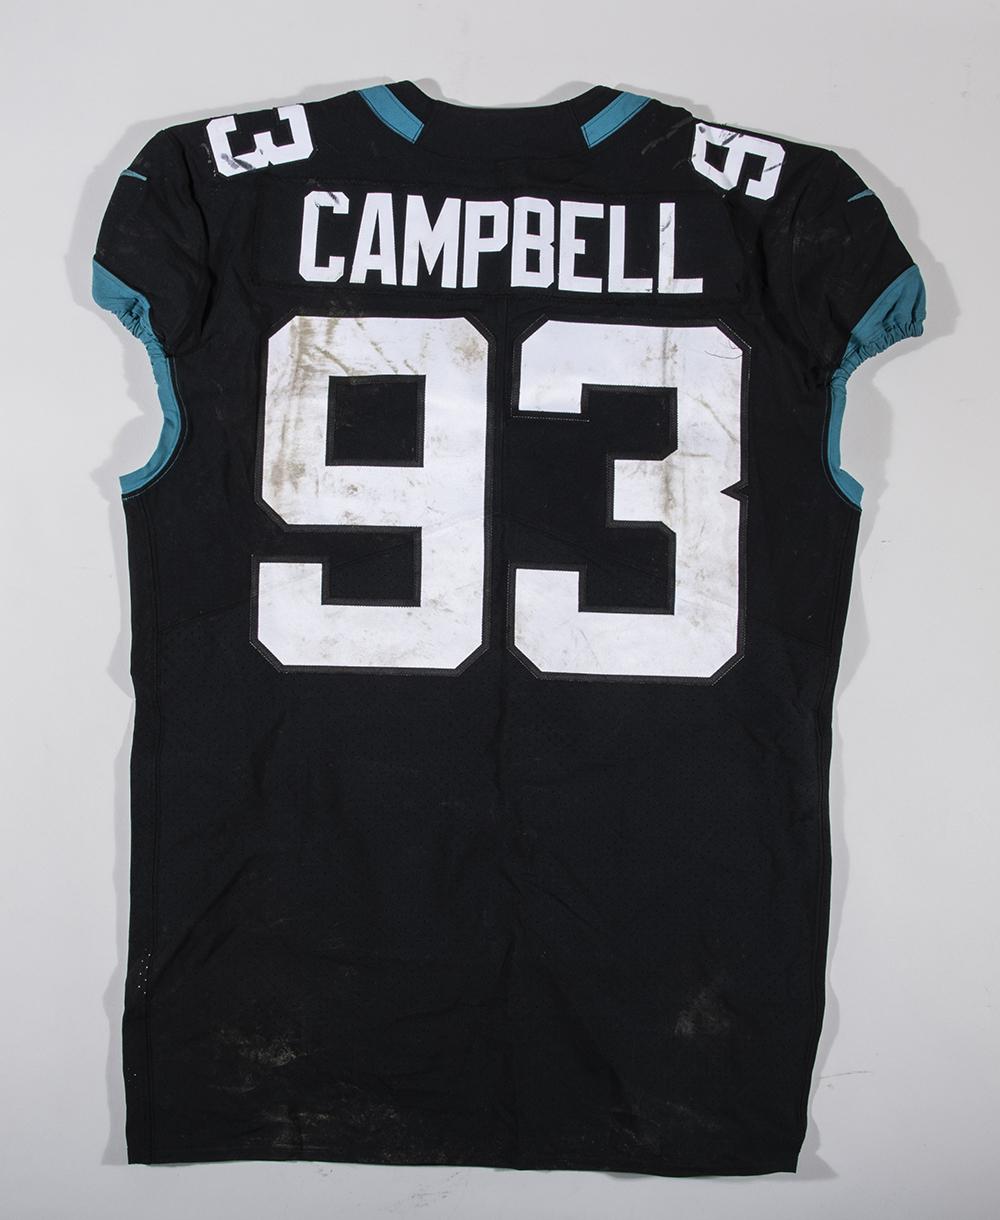 release date e0e36 10a86 10/28/2018 Calais Campbell game worn Jacksonville Jaguars ...